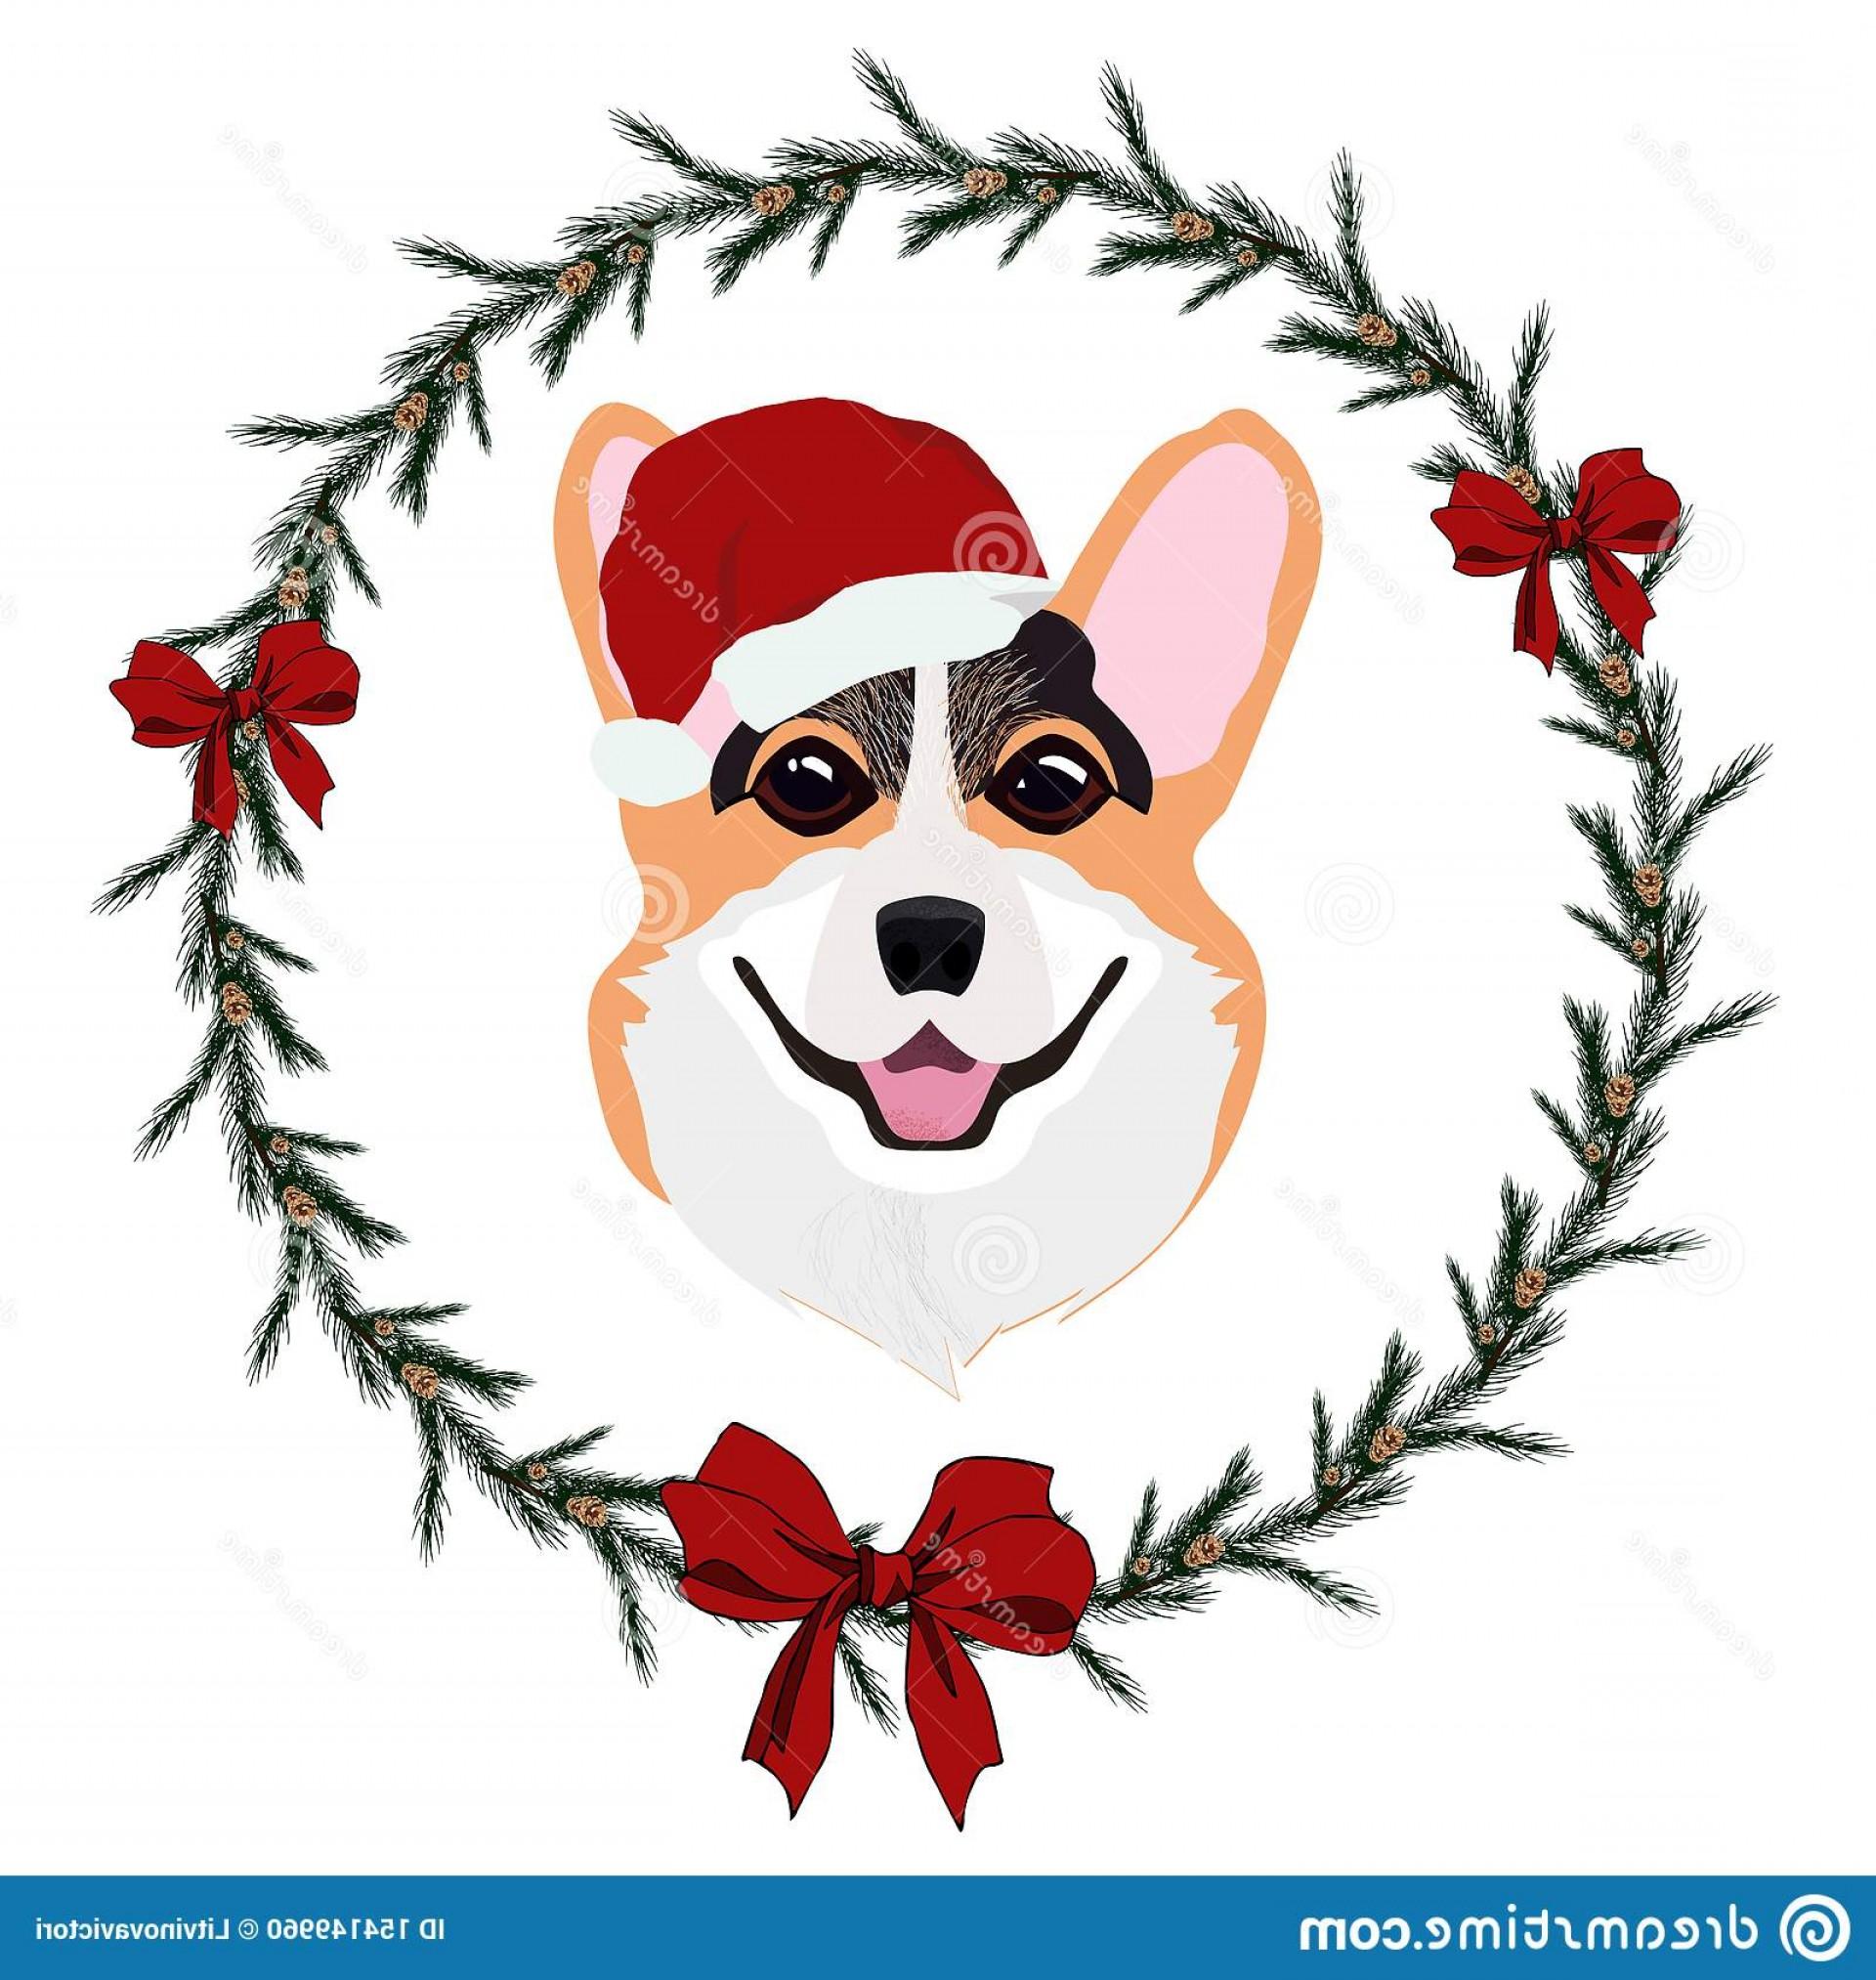 Corgi christmas hat clipart vector free download Corgi Christmas Vector | SOIDERGI vector free download